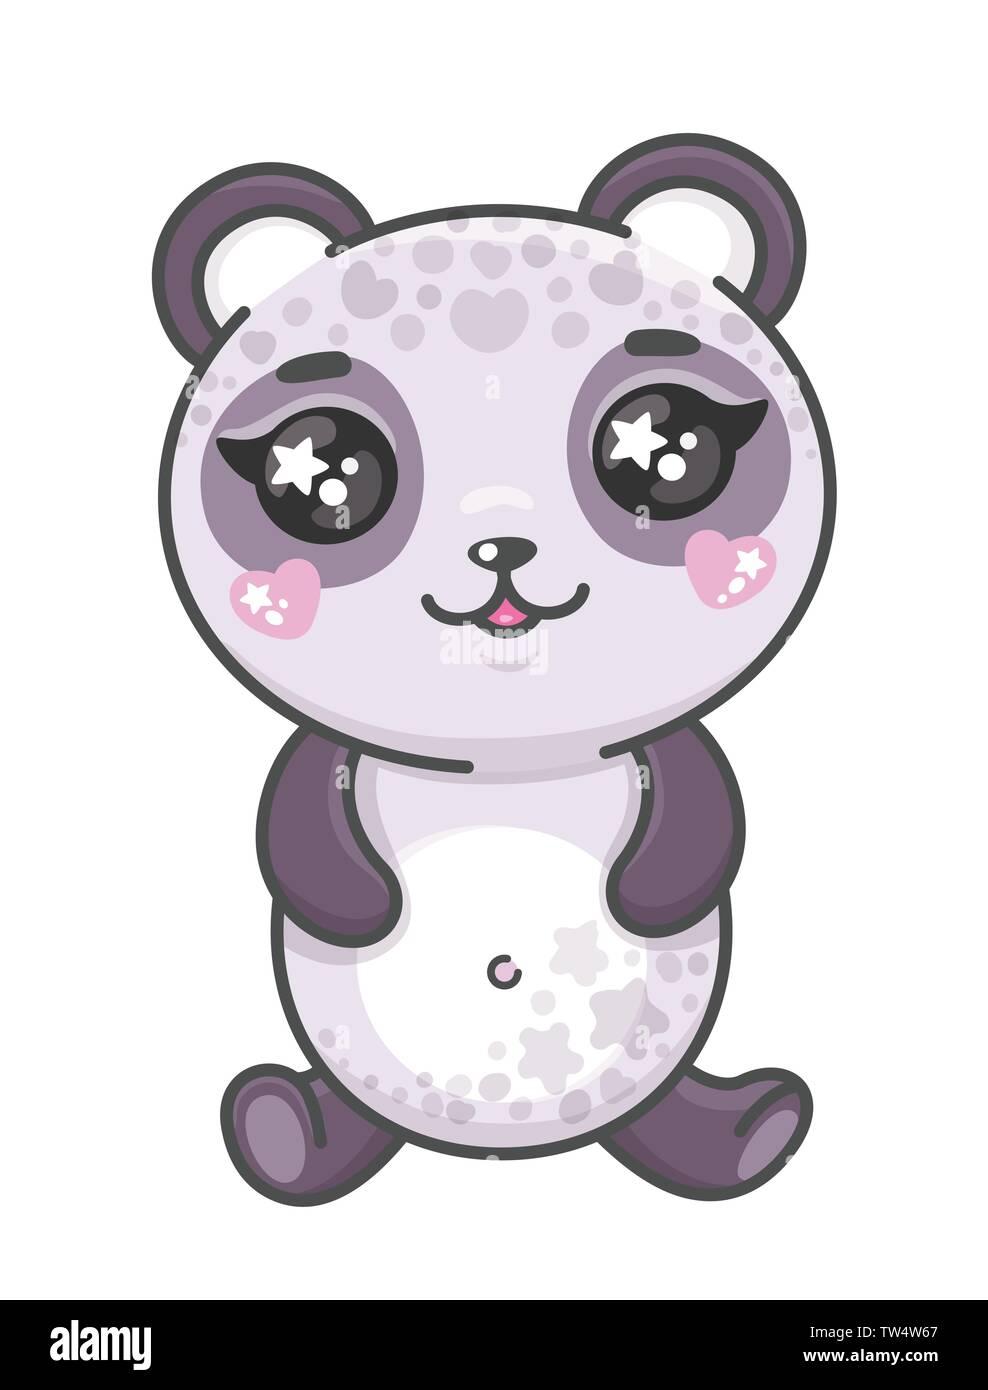 Cute Panda Cartoon Vector Illustration Smiling Baby Animal Panda In Kawaii Style Isolated On White Background Stock Vector Image Art Alamy